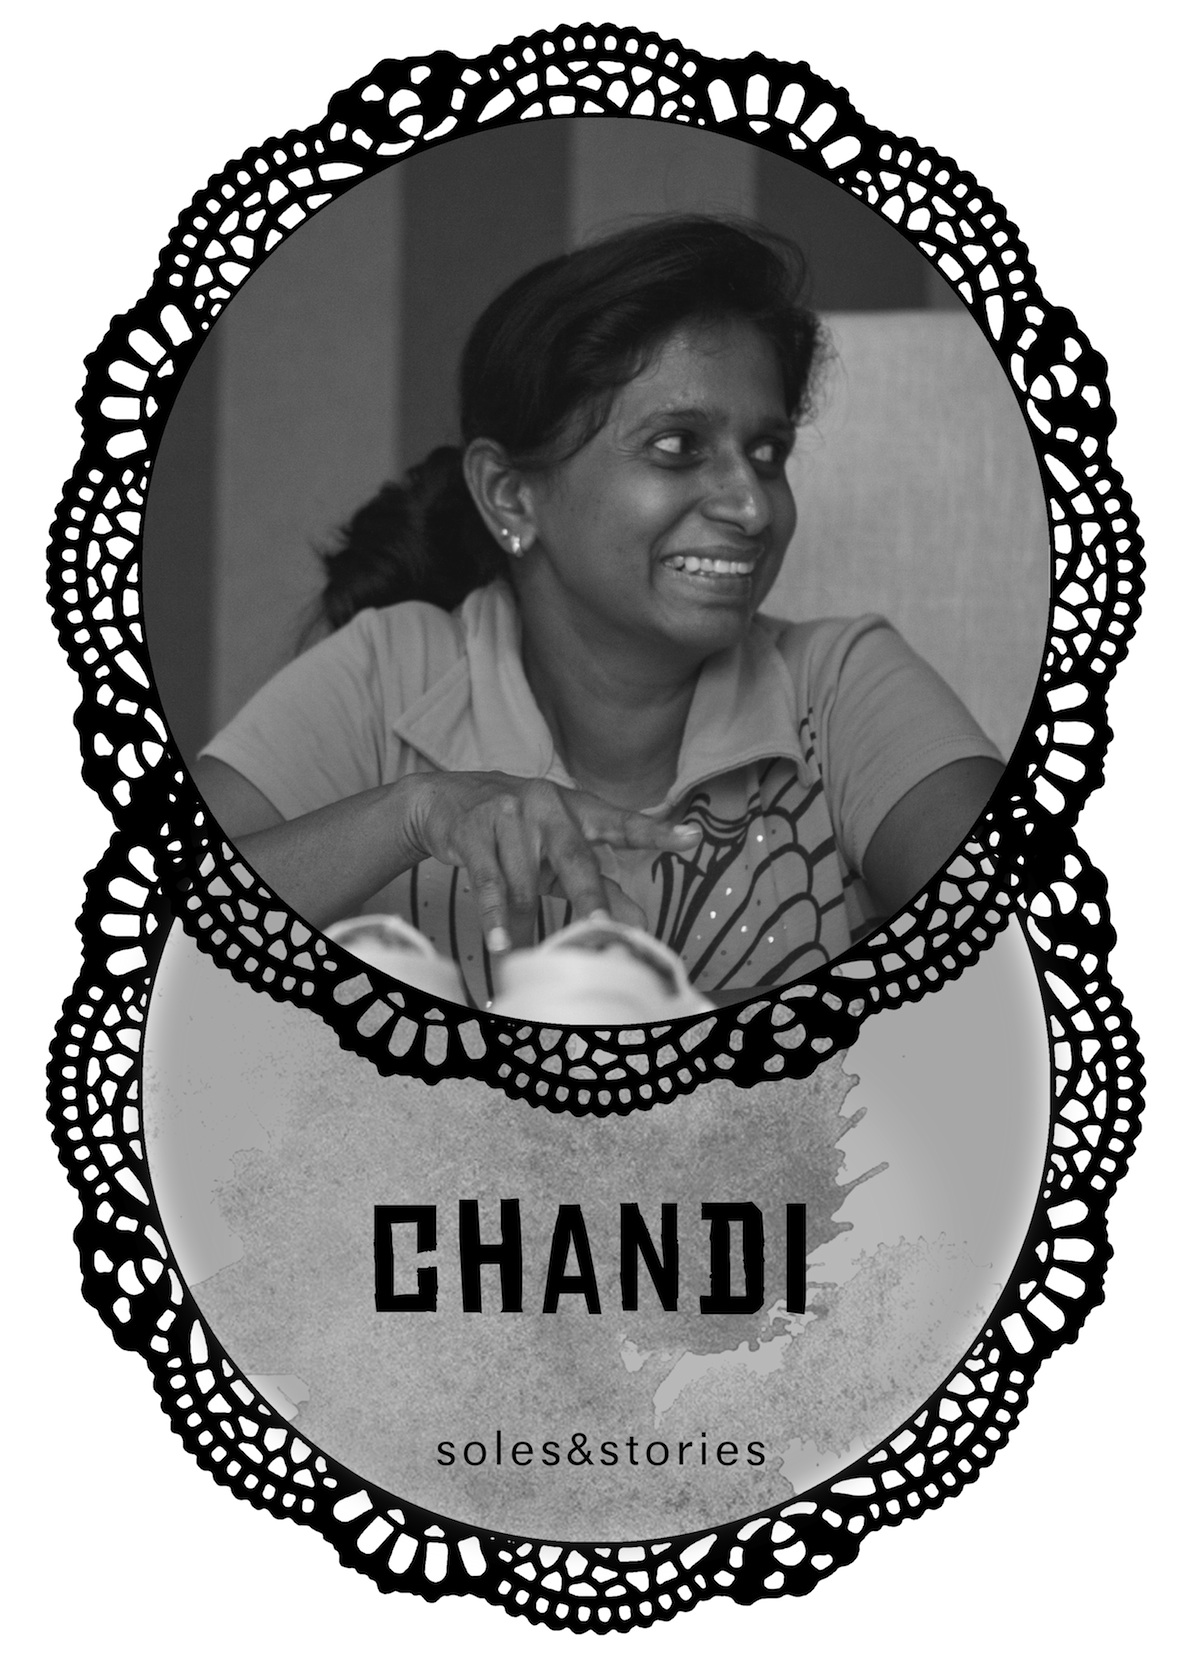 Chandi profile pic.jpg